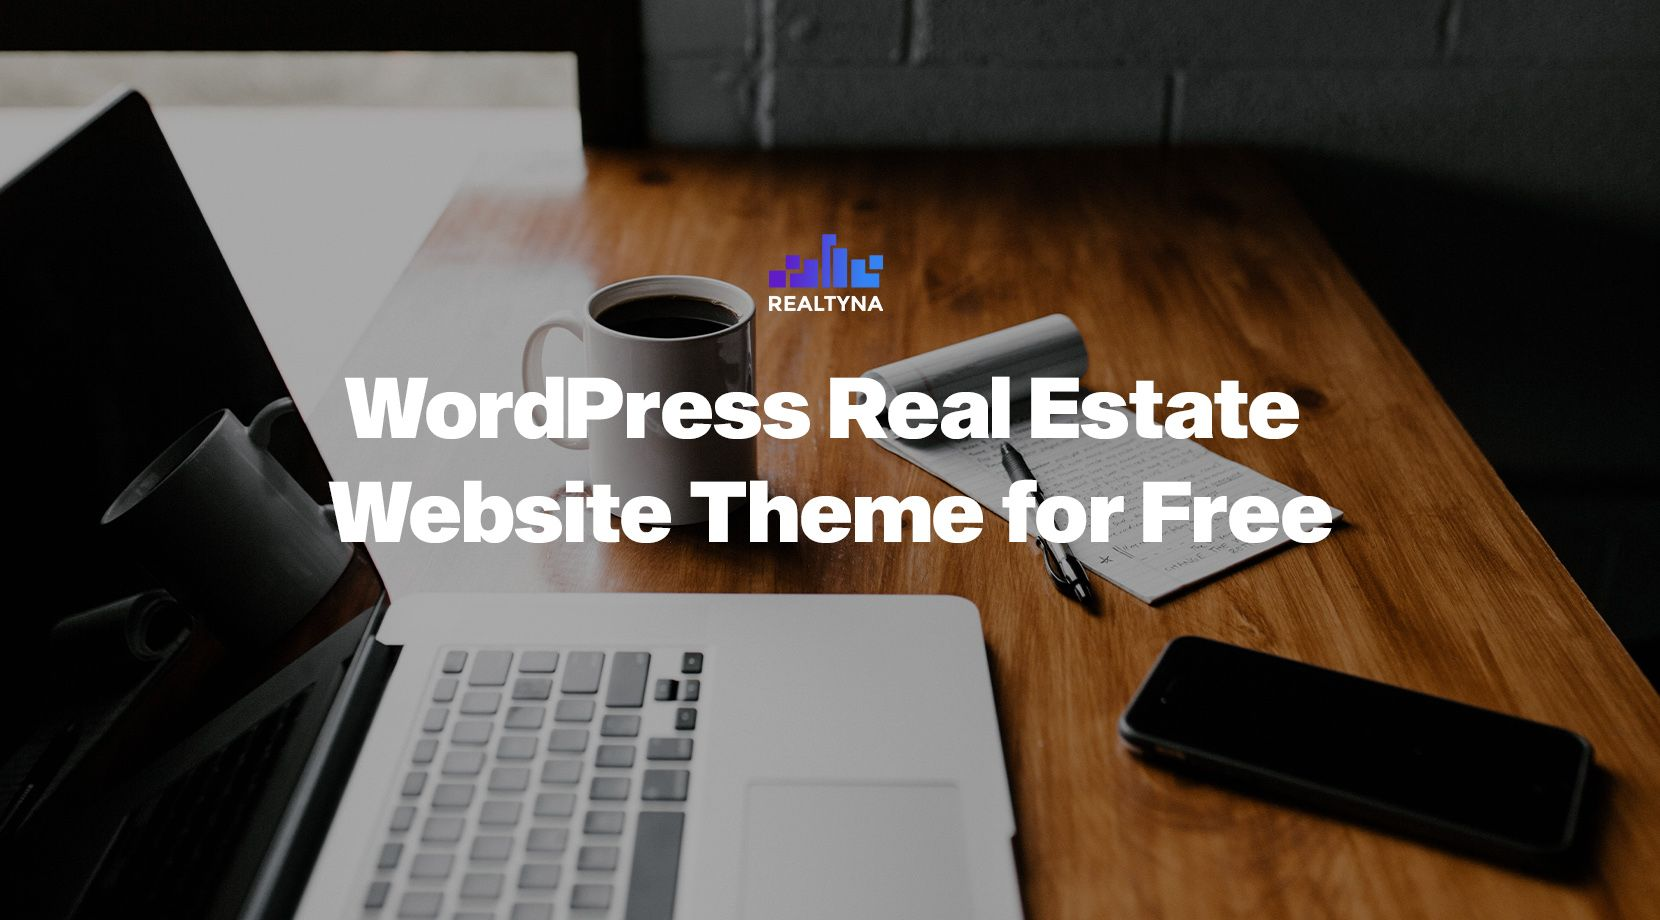 WordPress Real Estate Website Theme for Free